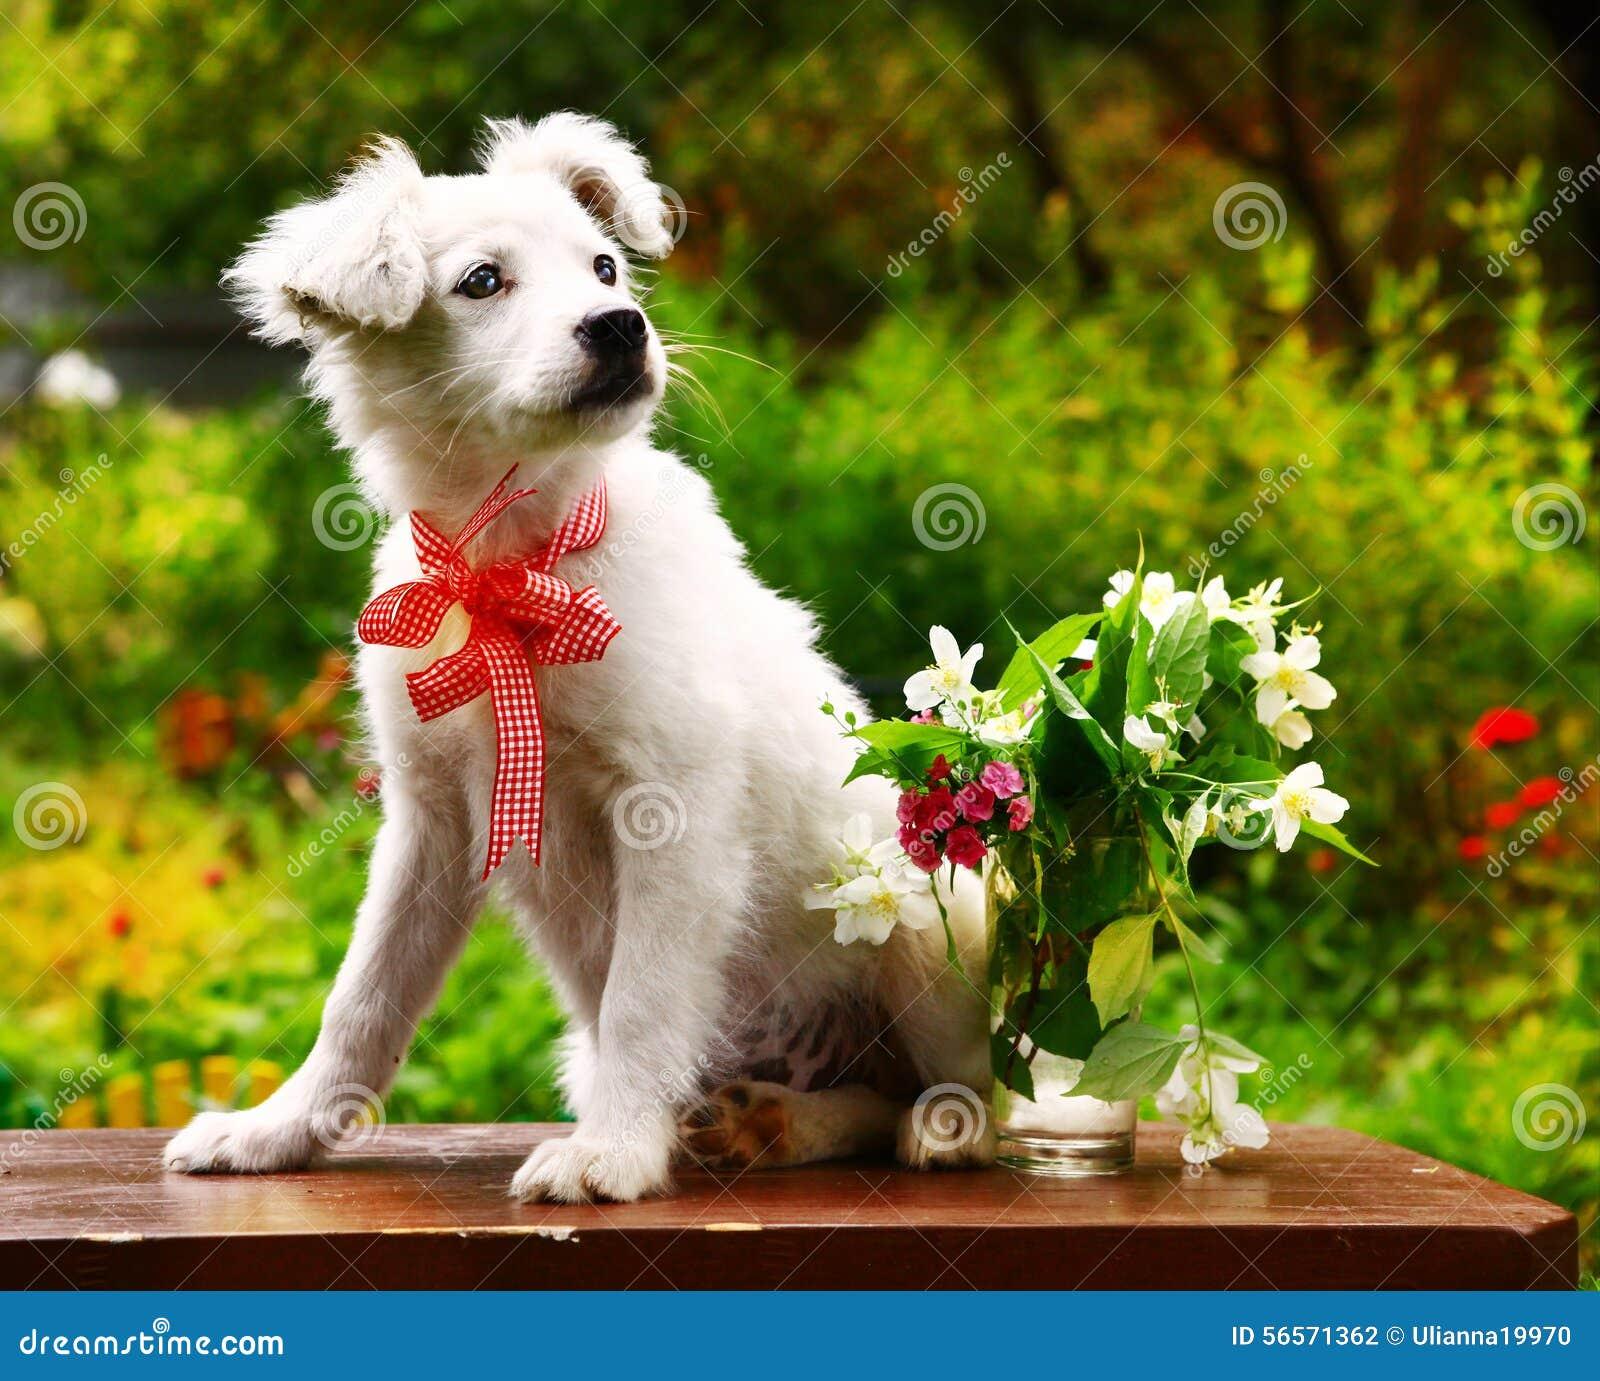 Download Το χνουδωτό άσπρο κουτάβι με το βάζο Jasmin και του γαρίφαλου ανθίζει στο υπόβαθρο θερινών κήπων Στοκ Εικόνες - εικόνα από breckenridge, αυτιά: 56571362